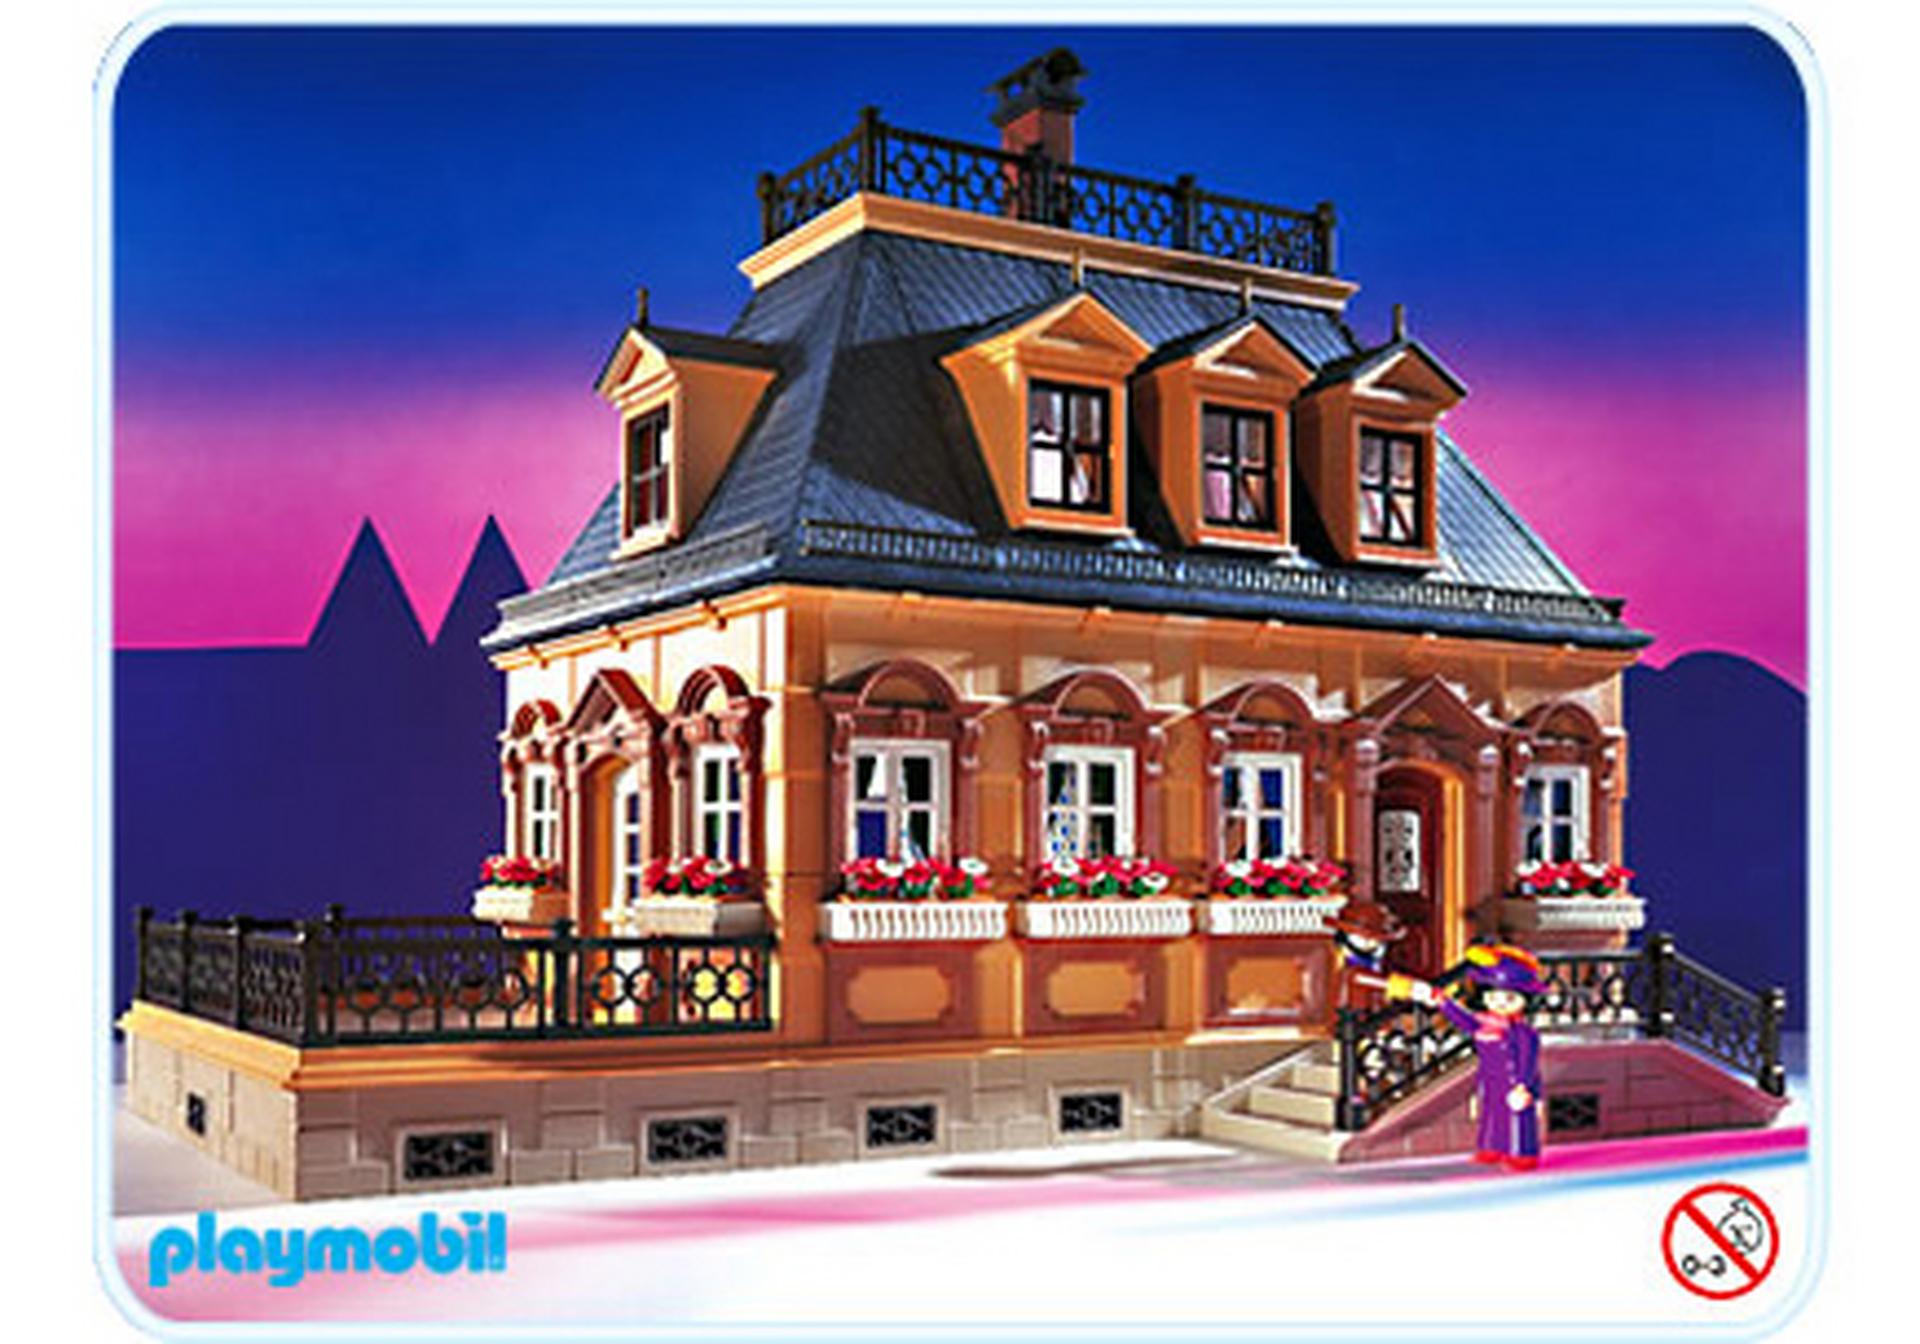 Villa kleines puppenhaus 5305 a playmobil for Mansion de playmobil